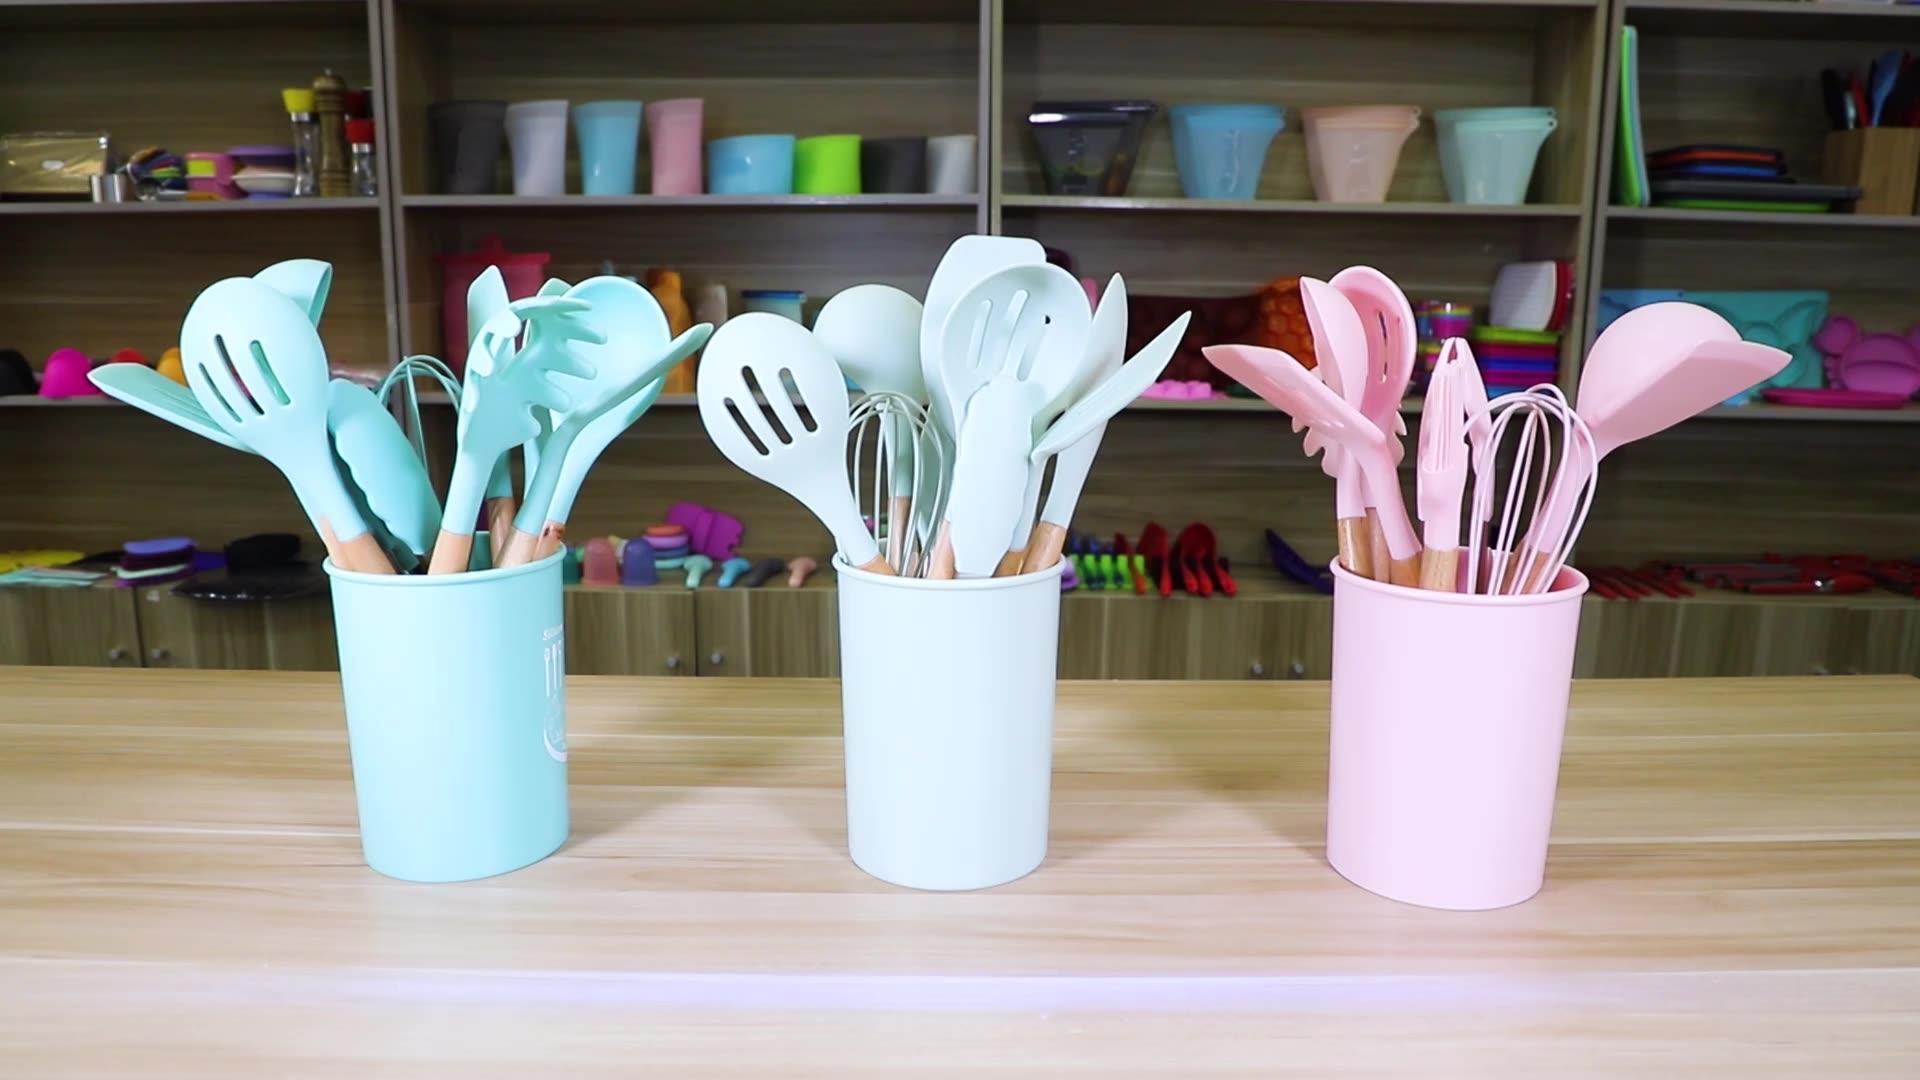 12-Piece Silicone Kitchen Utensil Set Kitchen Accessories With Wood Handle